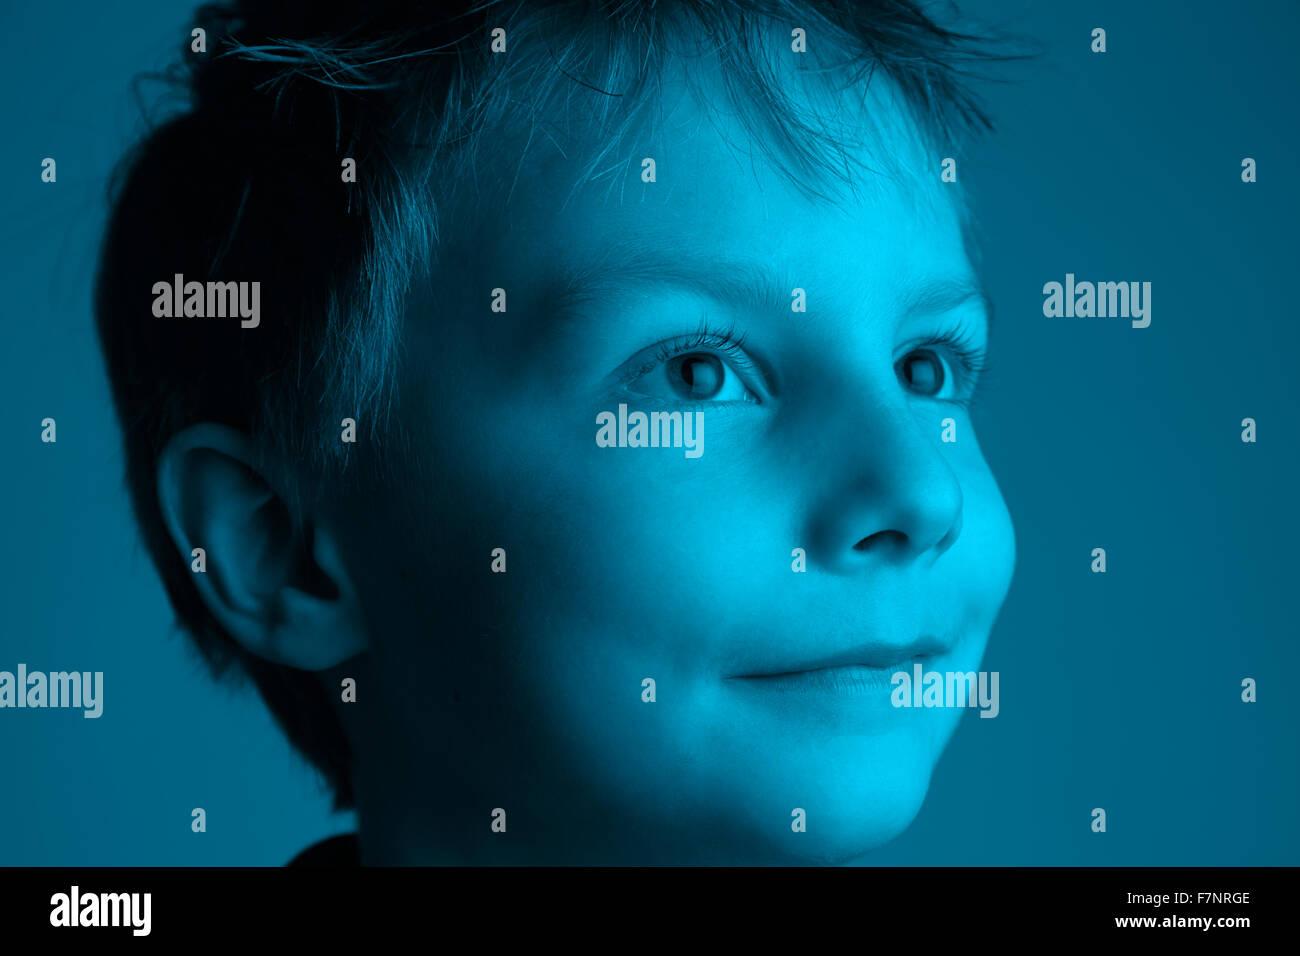 Big expectation - big eyes: eight year old boy looking towards the light - Stock Image